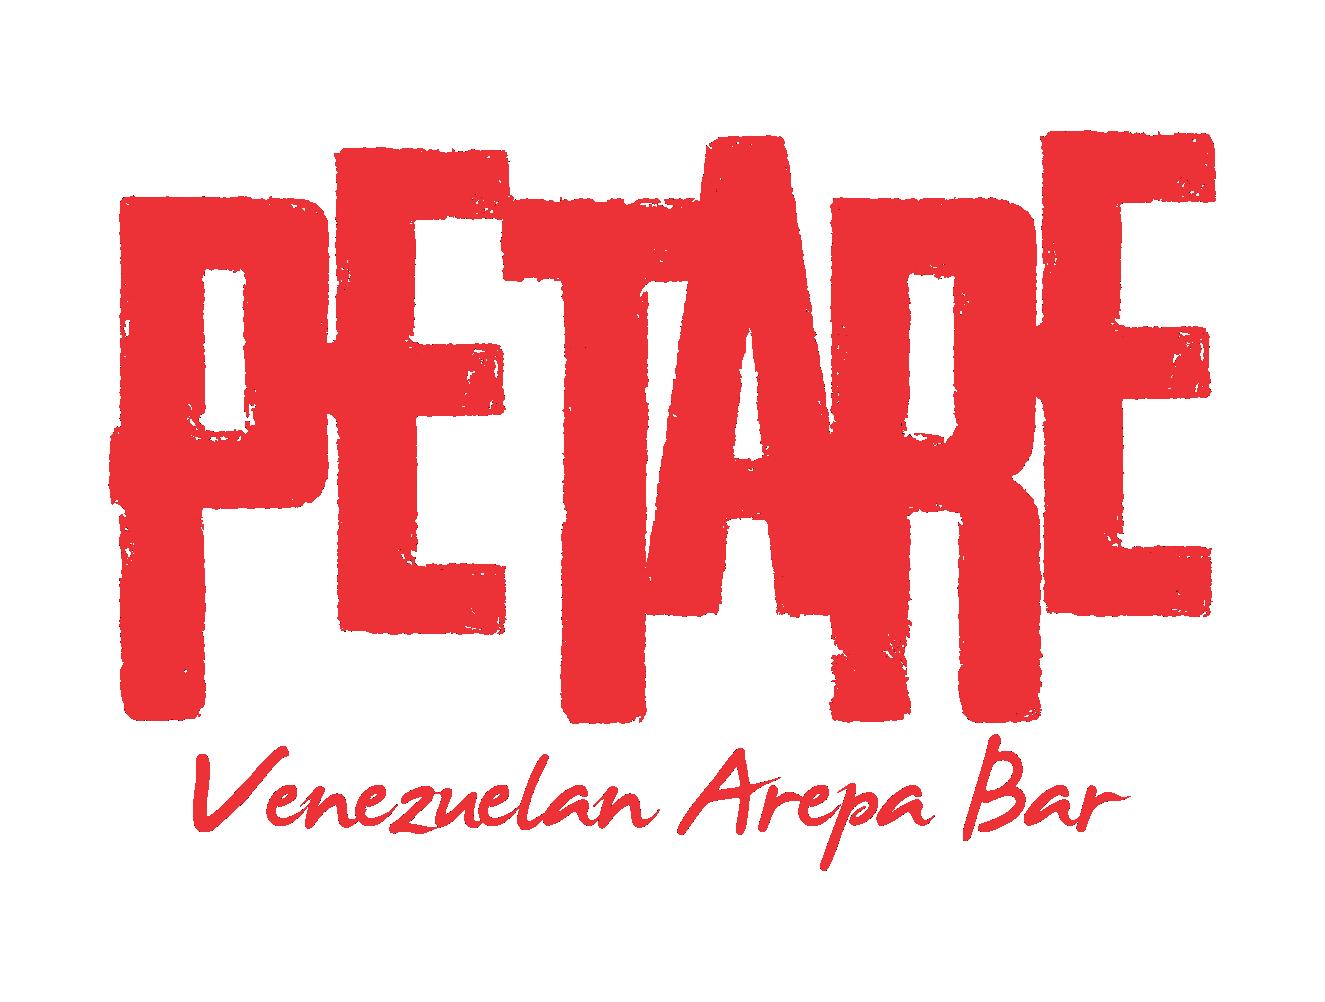 PETARE - Venezuelan Street Food